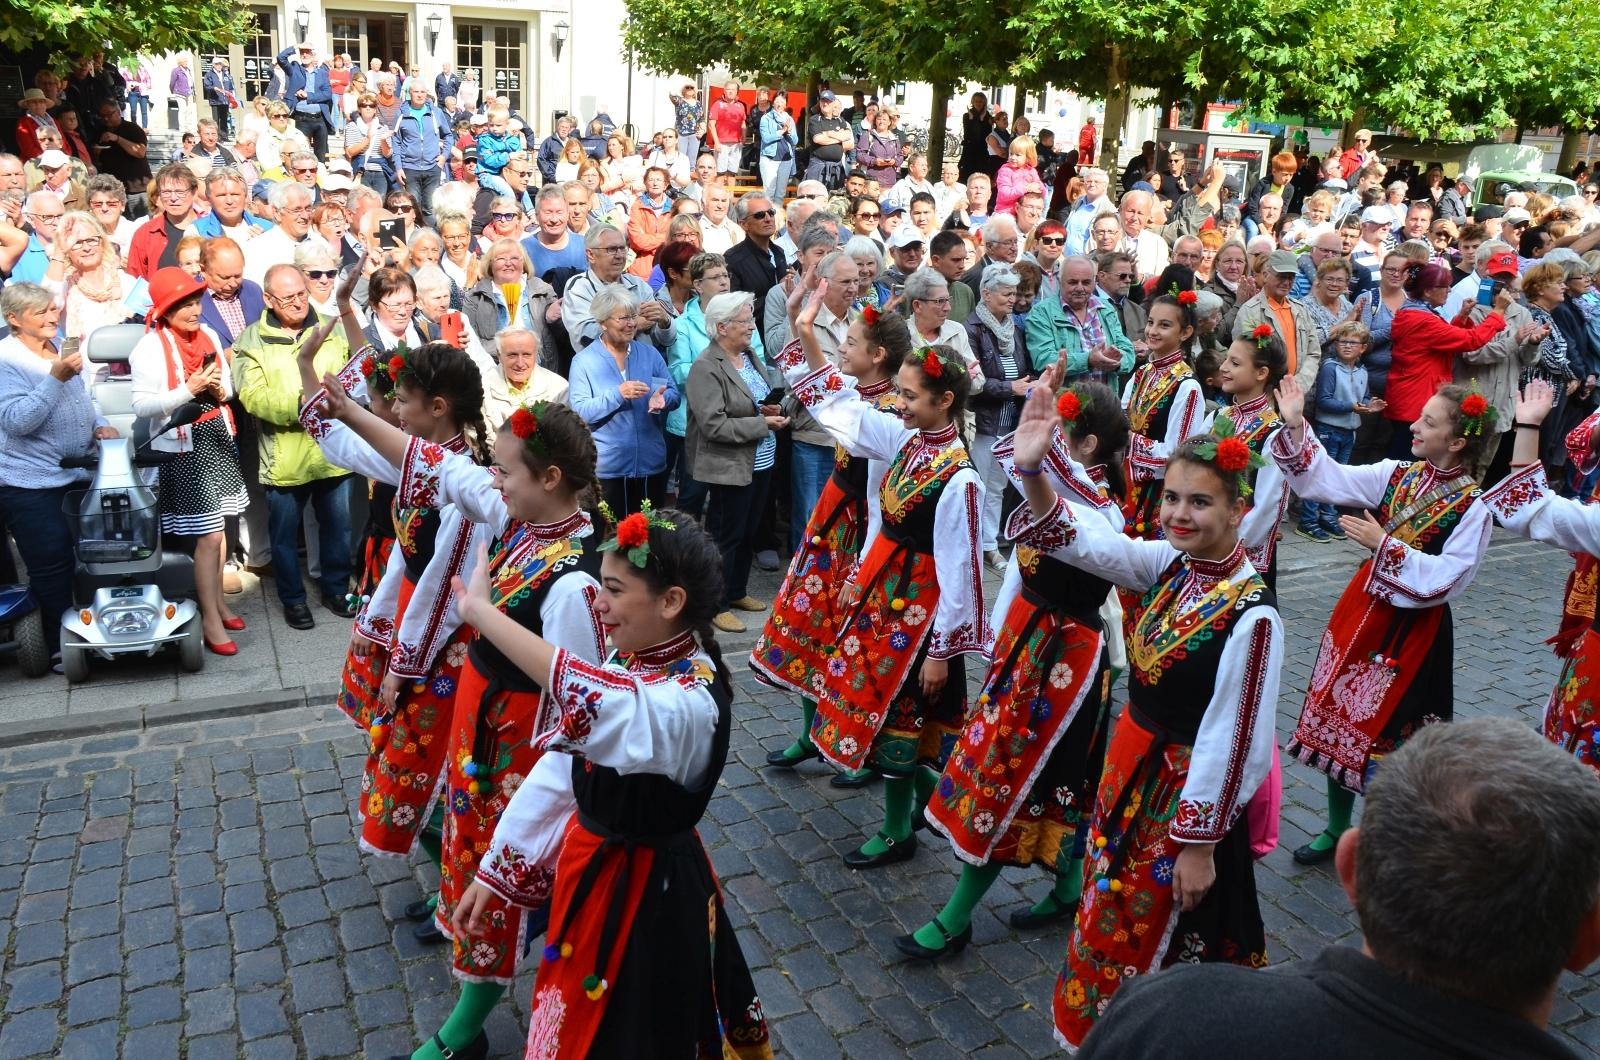 Hortse Brandenburg Tag